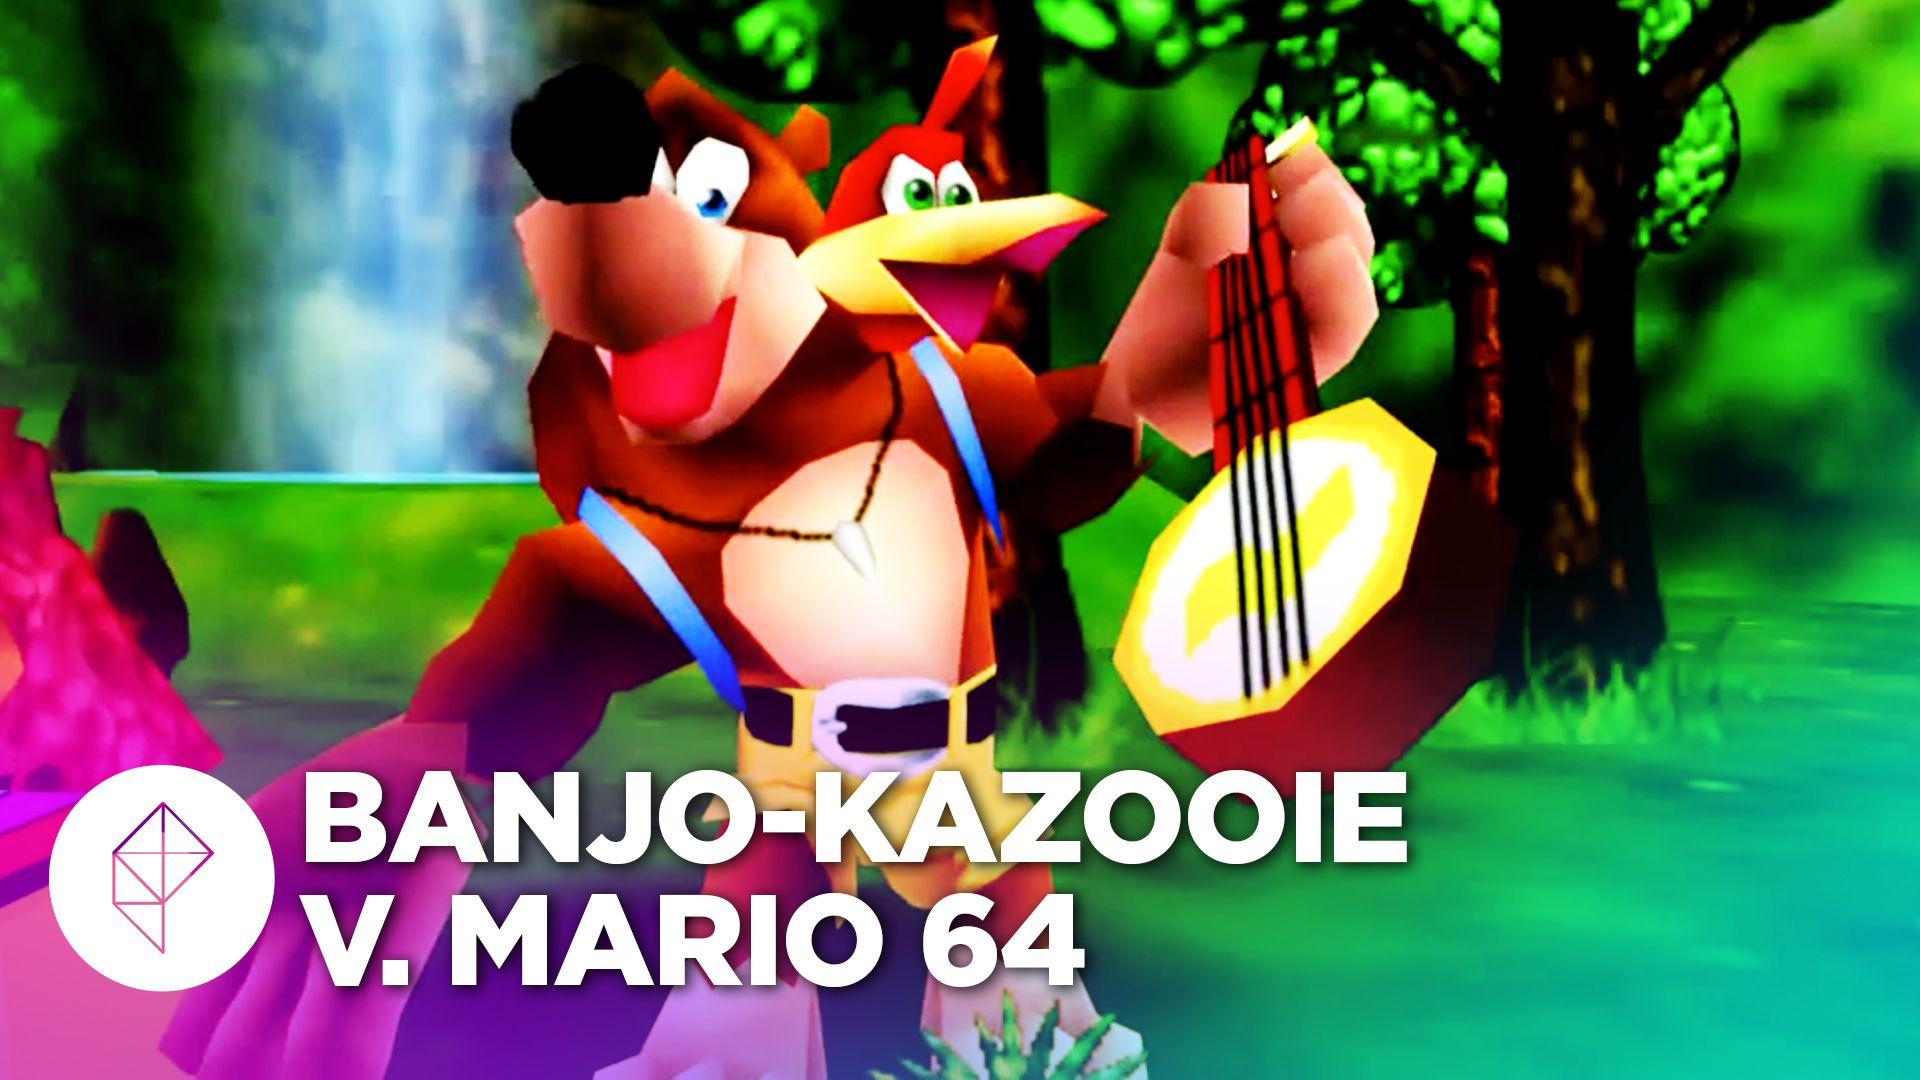 How 'Banjo-Kazooie' Became a Bridge Between Marios - The Ringer